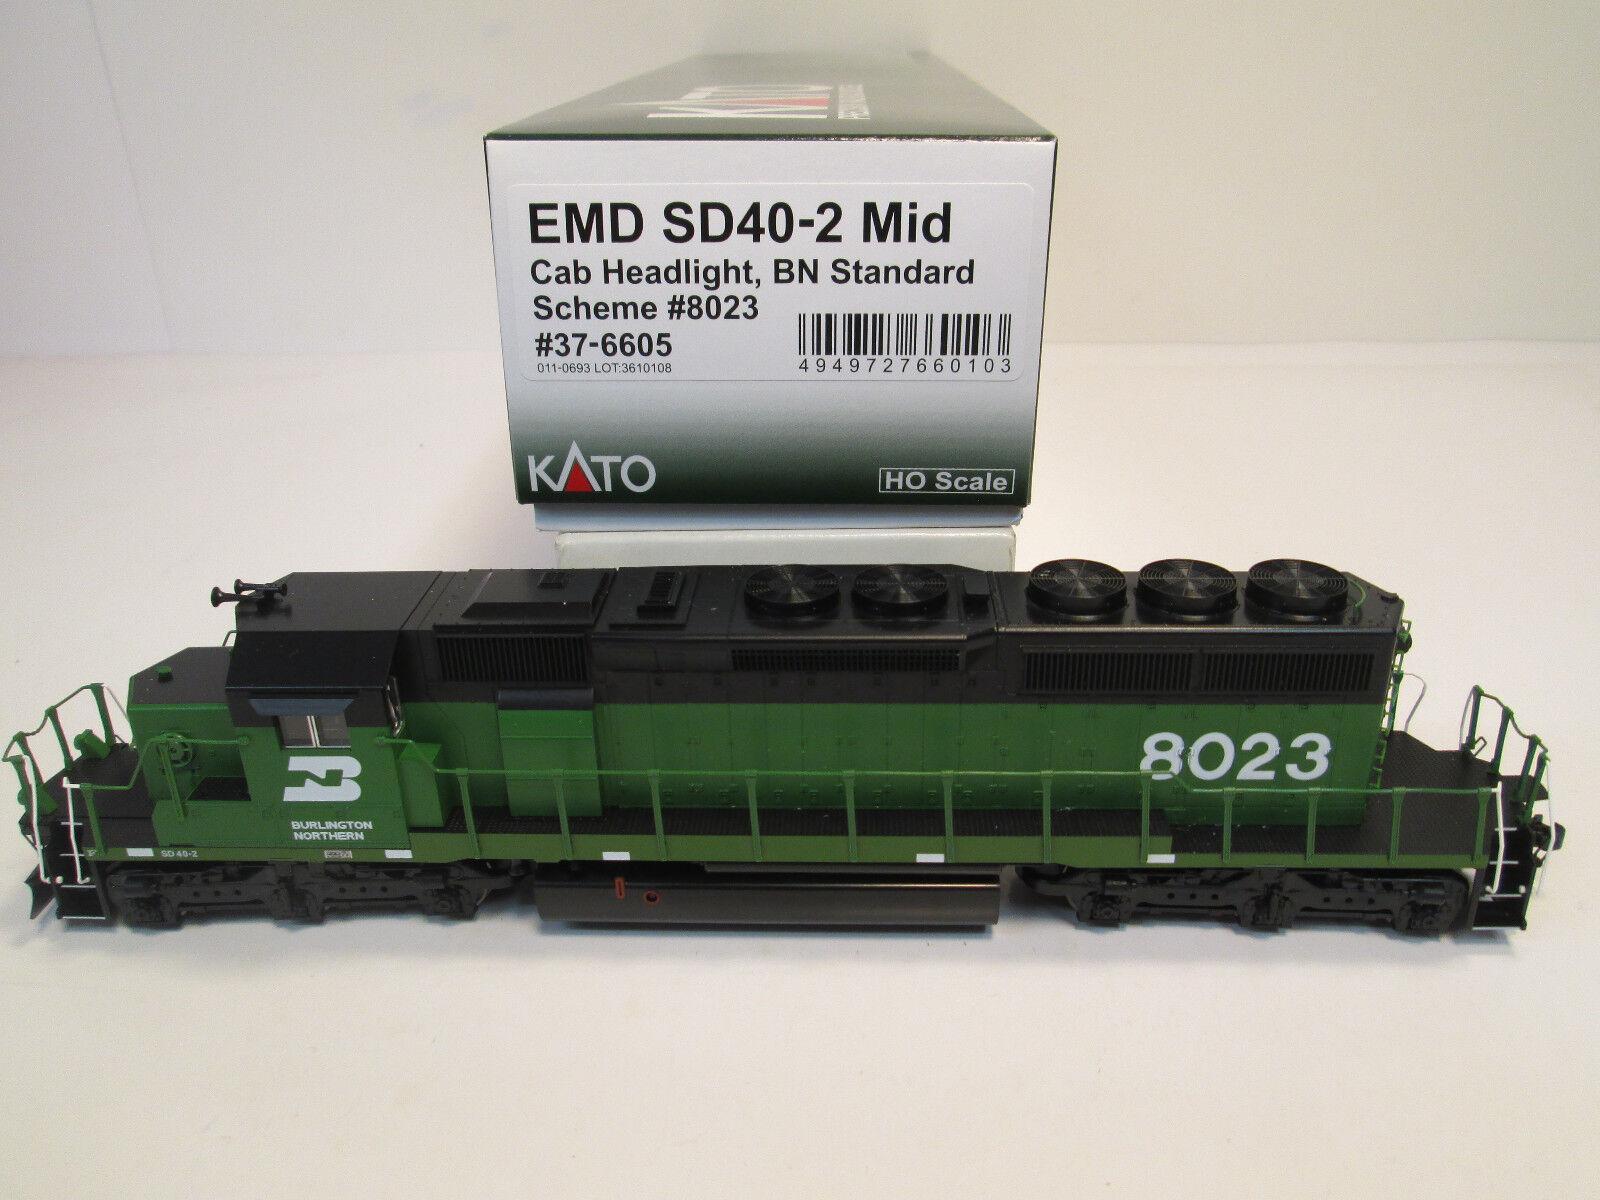 Kato Burlington Northern EMD SD 40-2 Mid 8023 (Kato 37-6605)